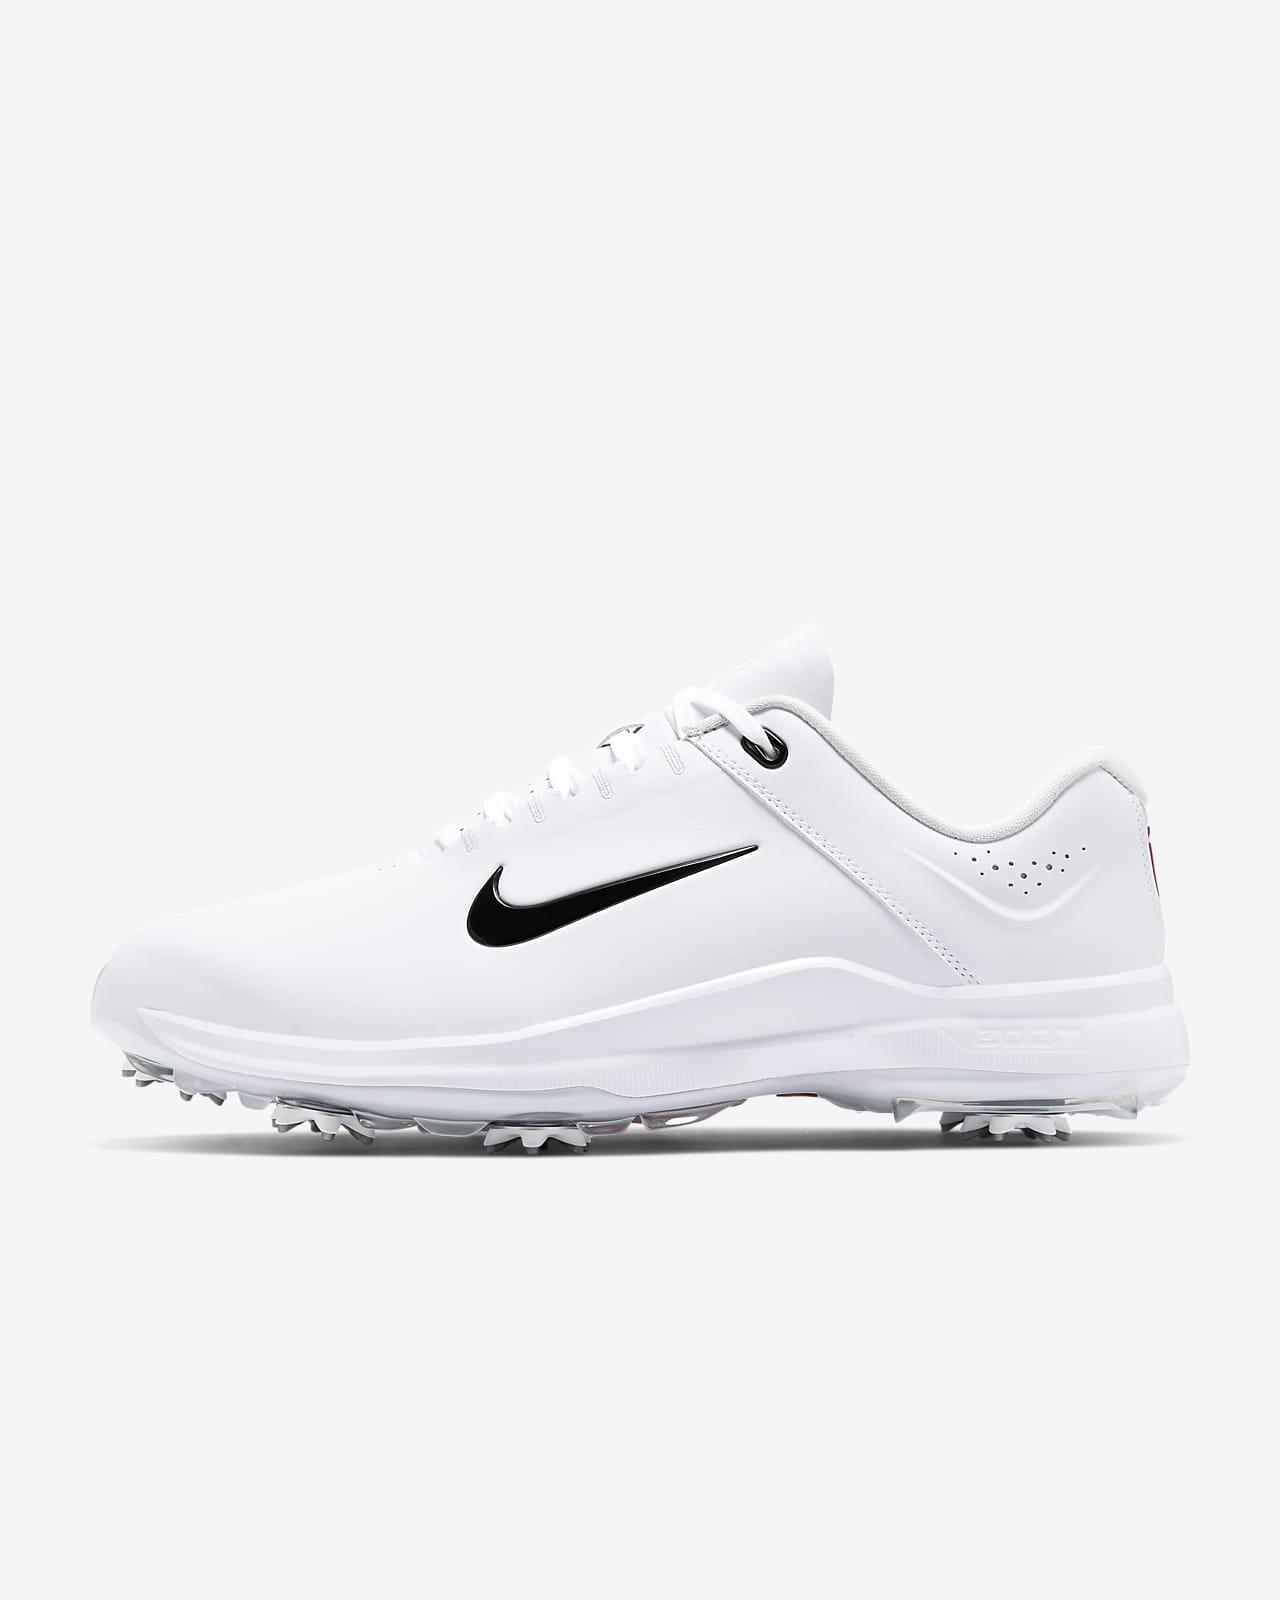 Nike TW20 (W) 男子高尔夫球鞋(宽版)